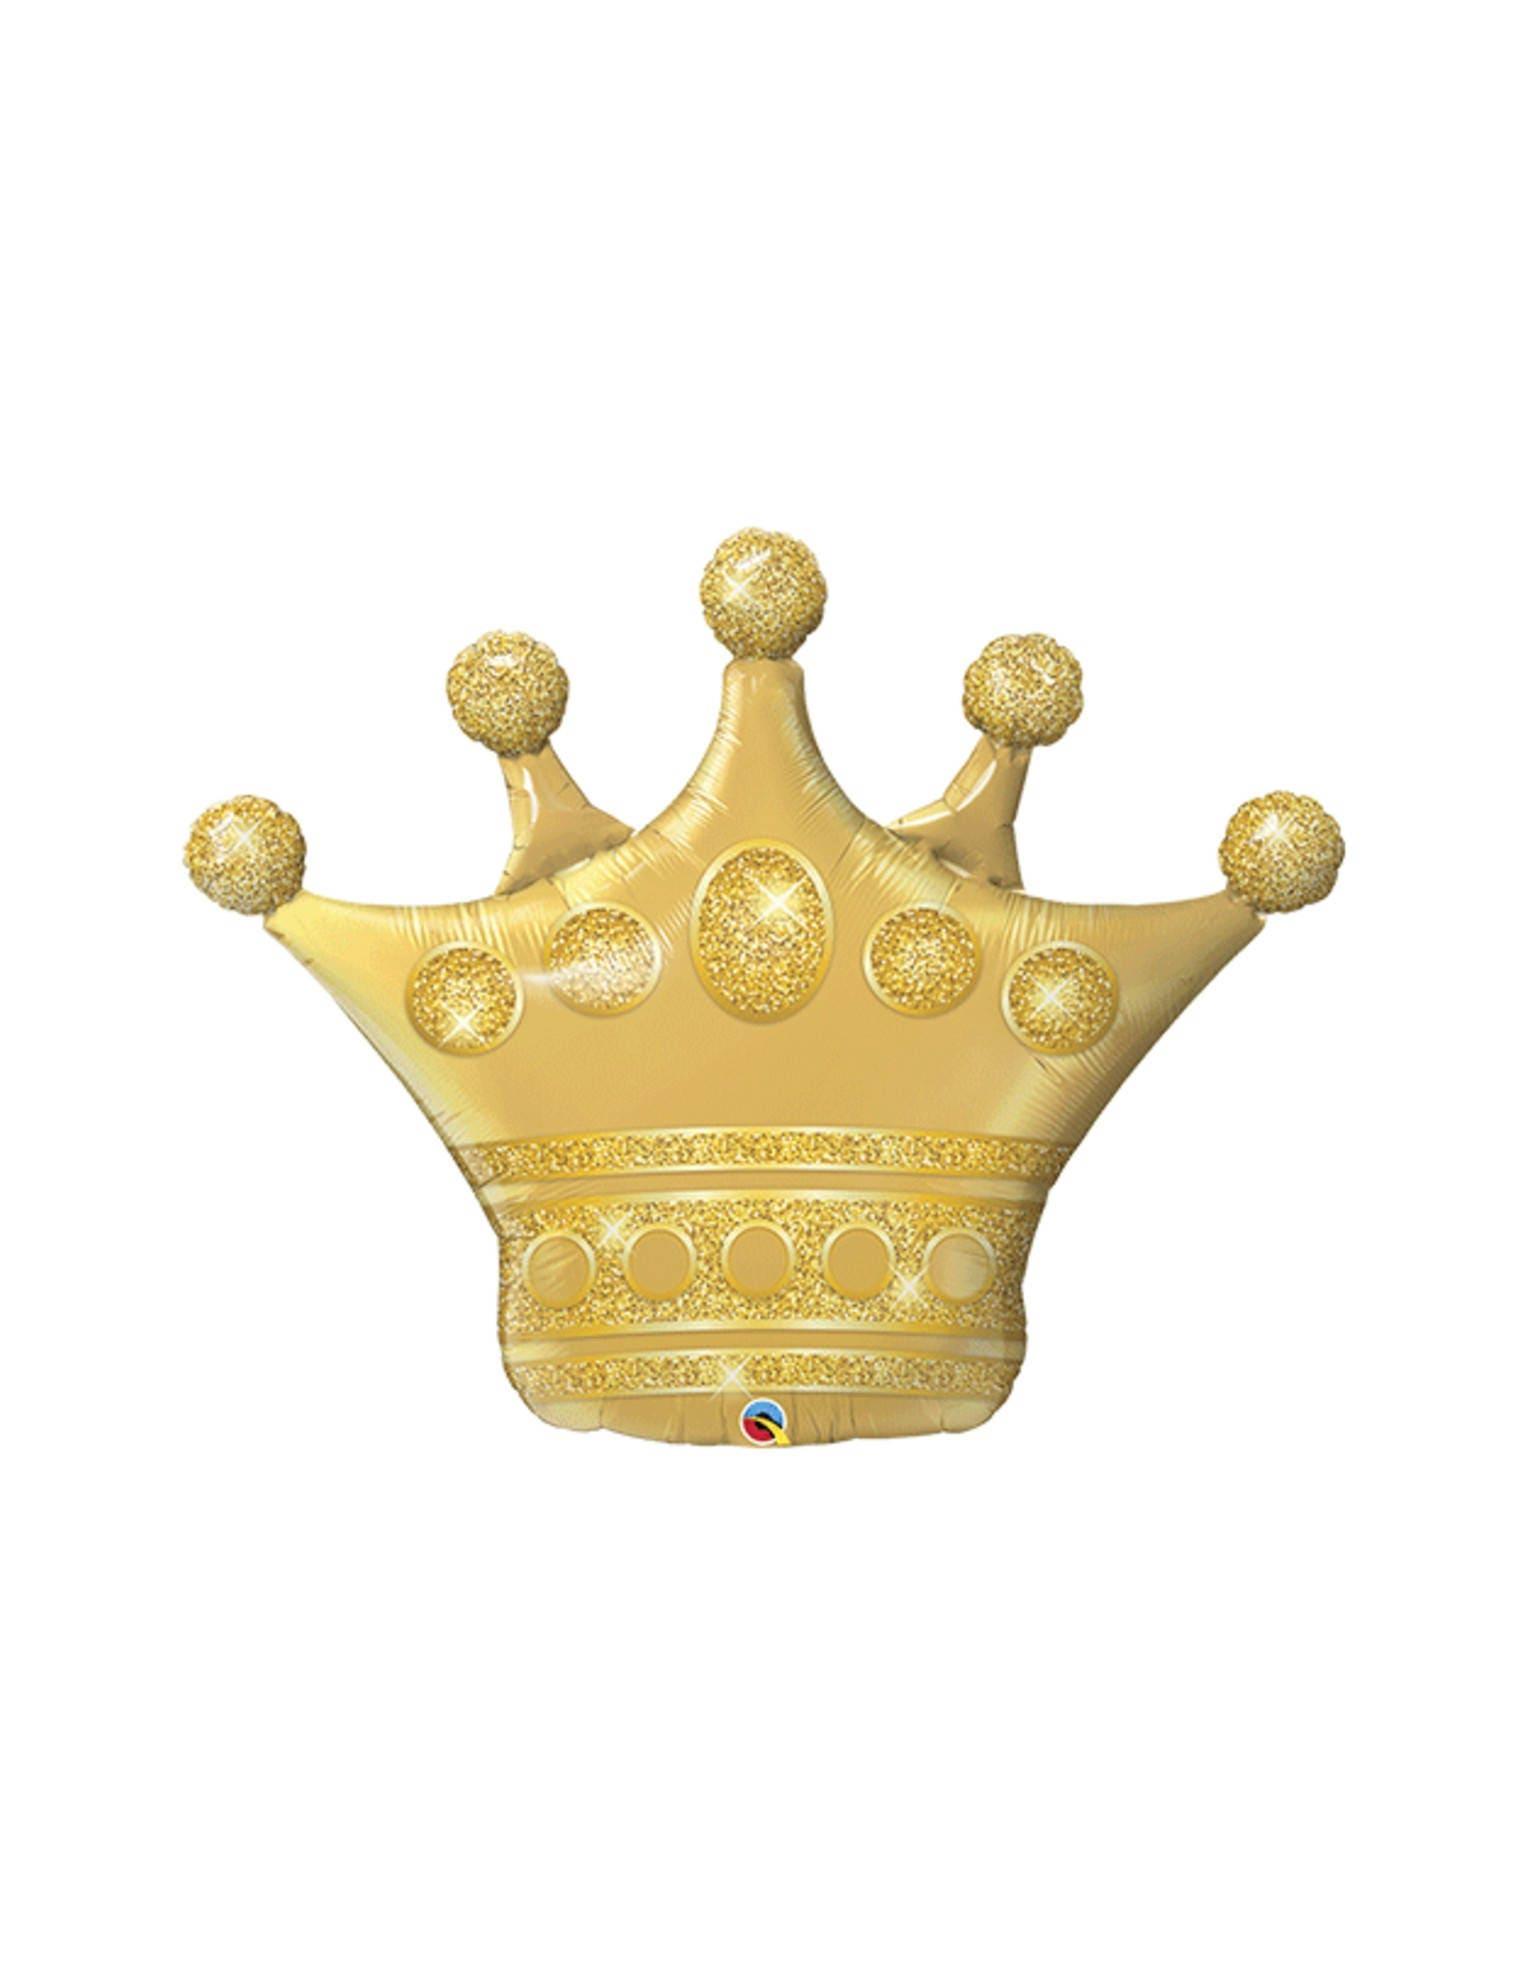 41 Crown Balloon Princess Birthday Baby Shower